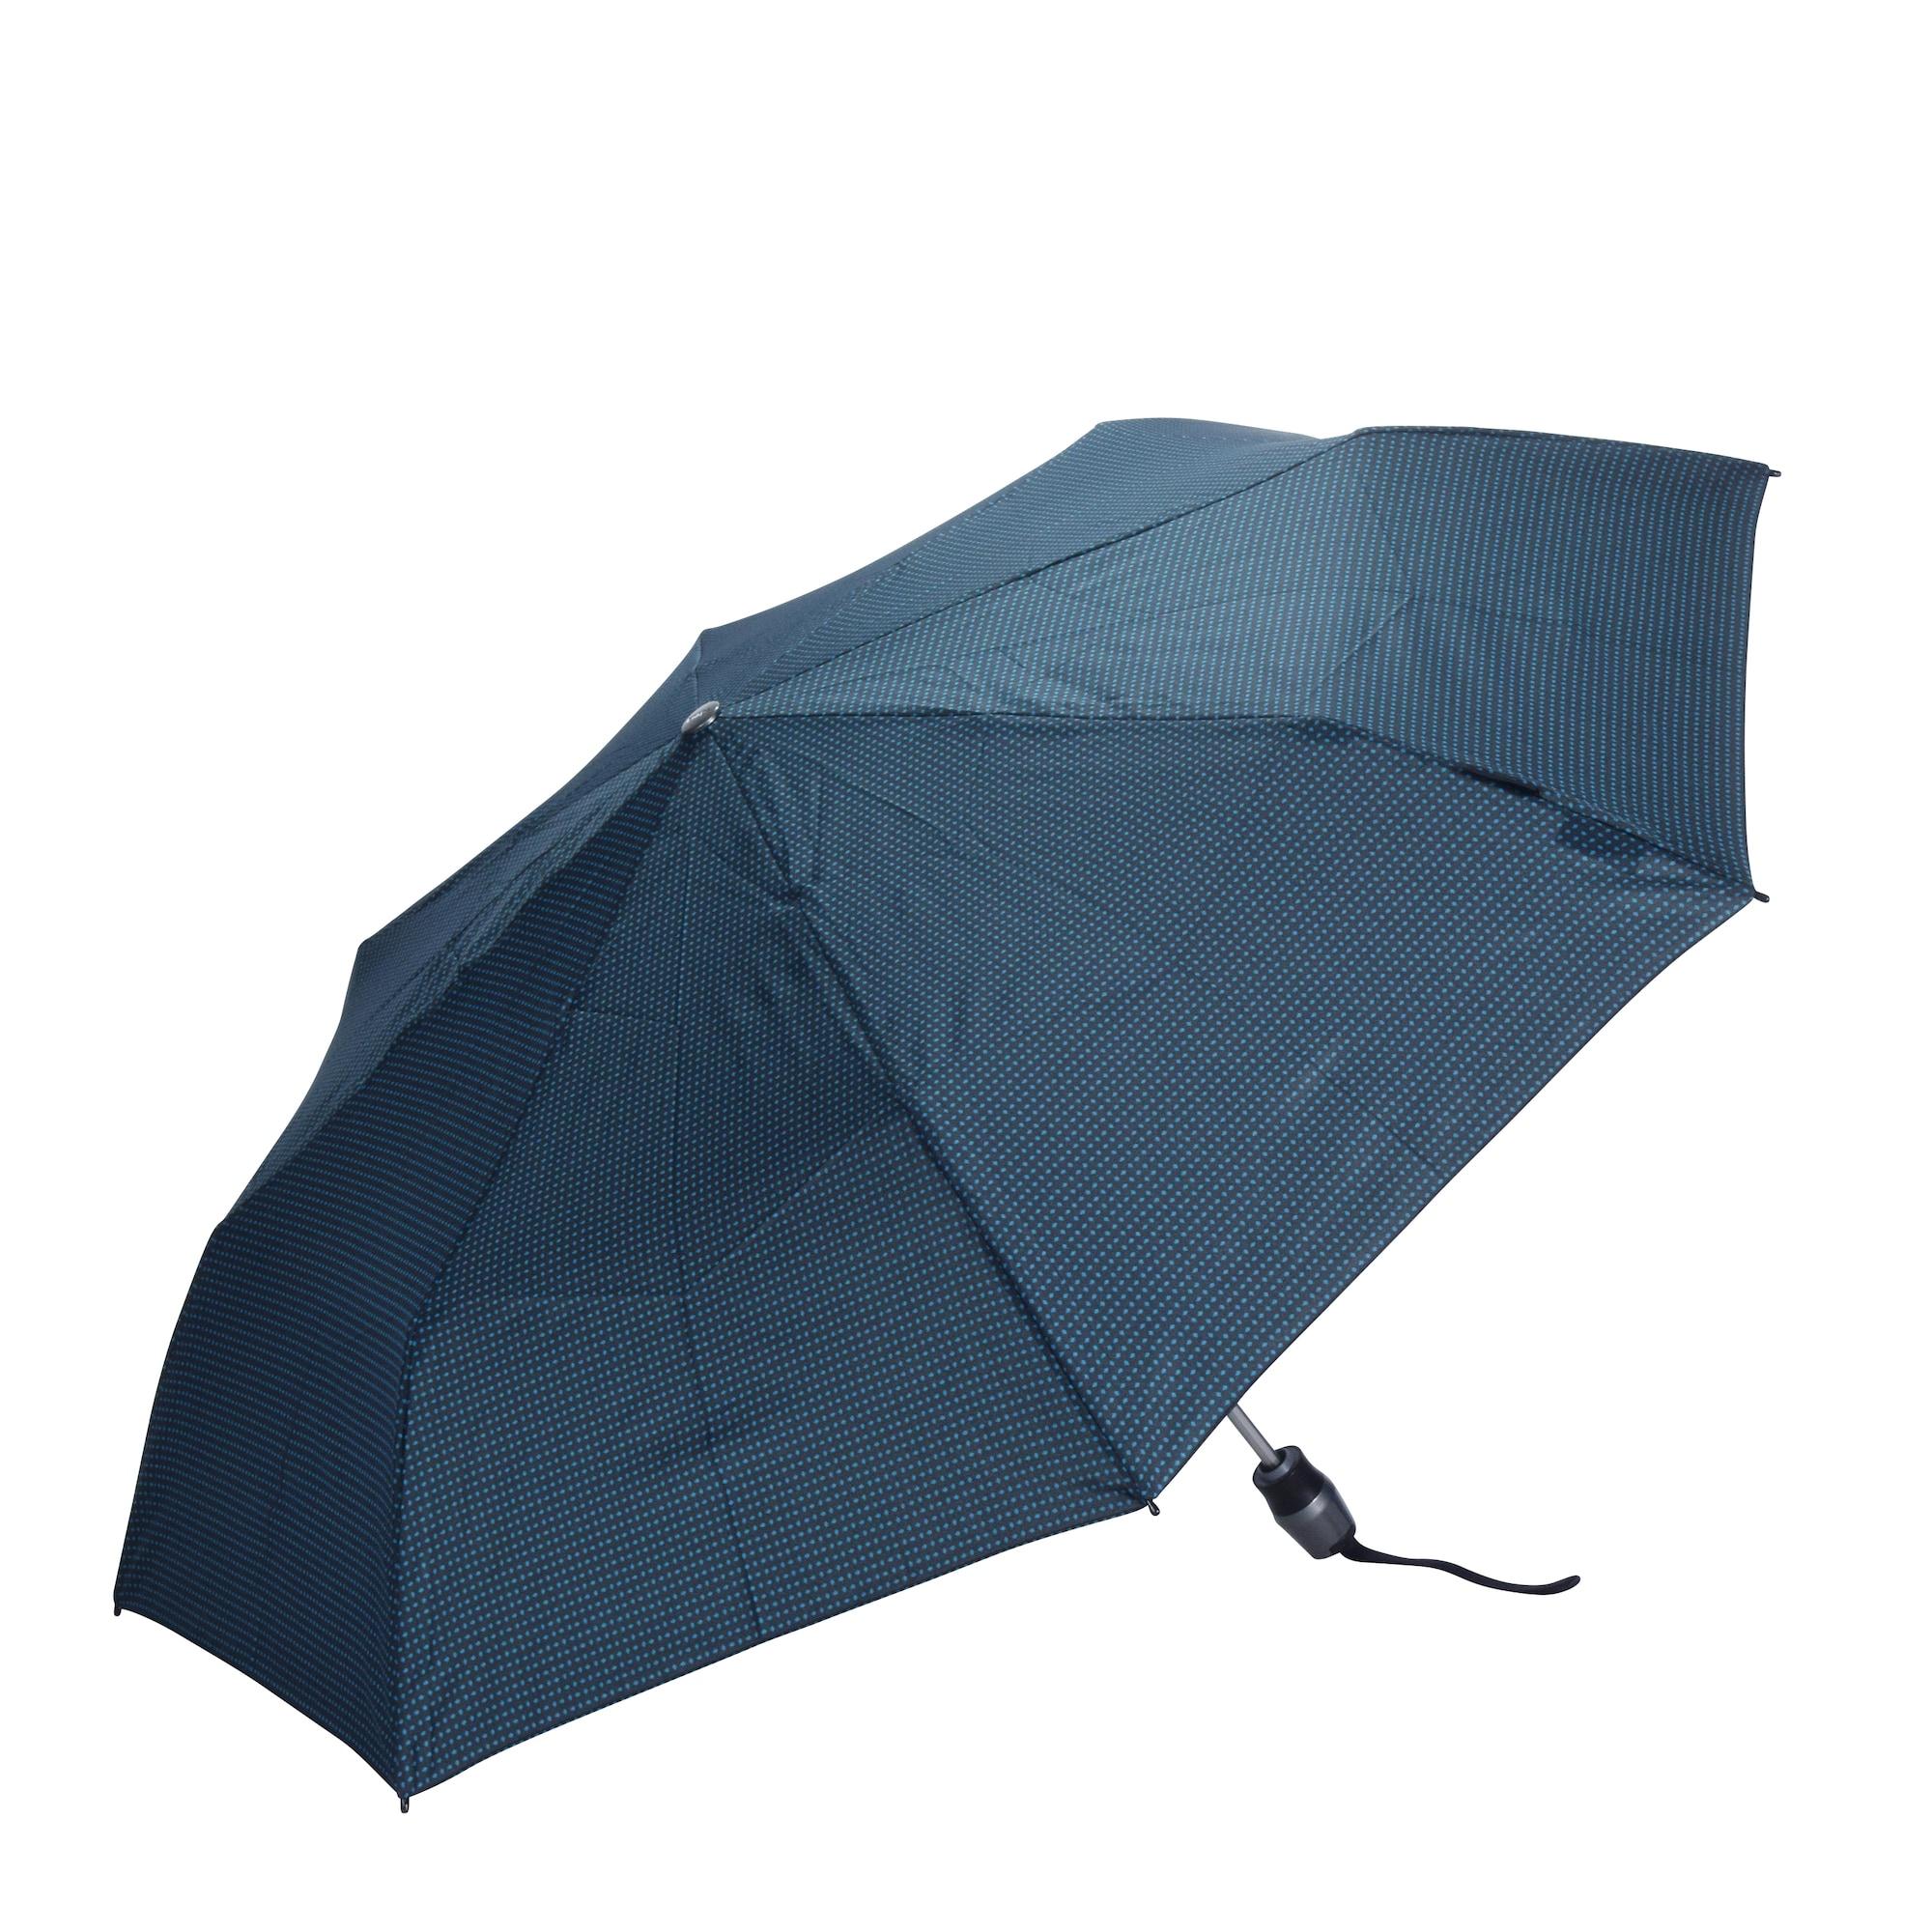 Taschenschirm 'T .200' 28 cm | Accessoires > Regenschirme | knirps